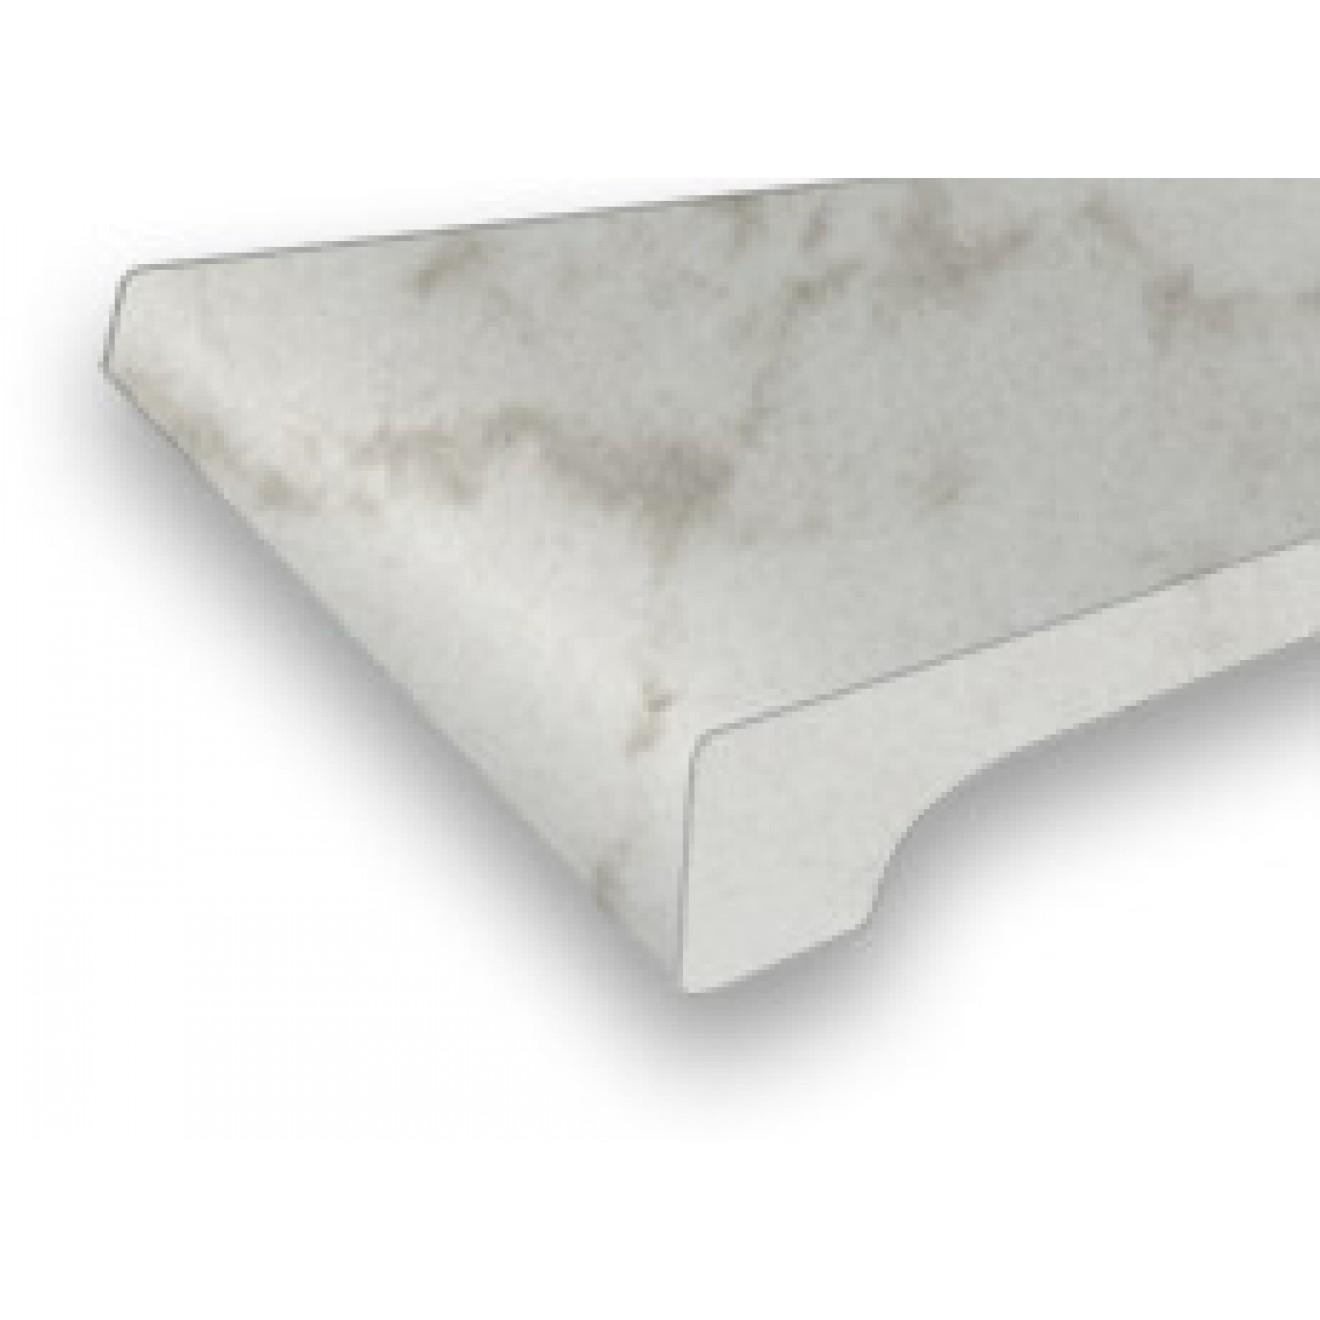 Fensterbank Exclusiv Farbe marmor bianco Ausl. 150mm